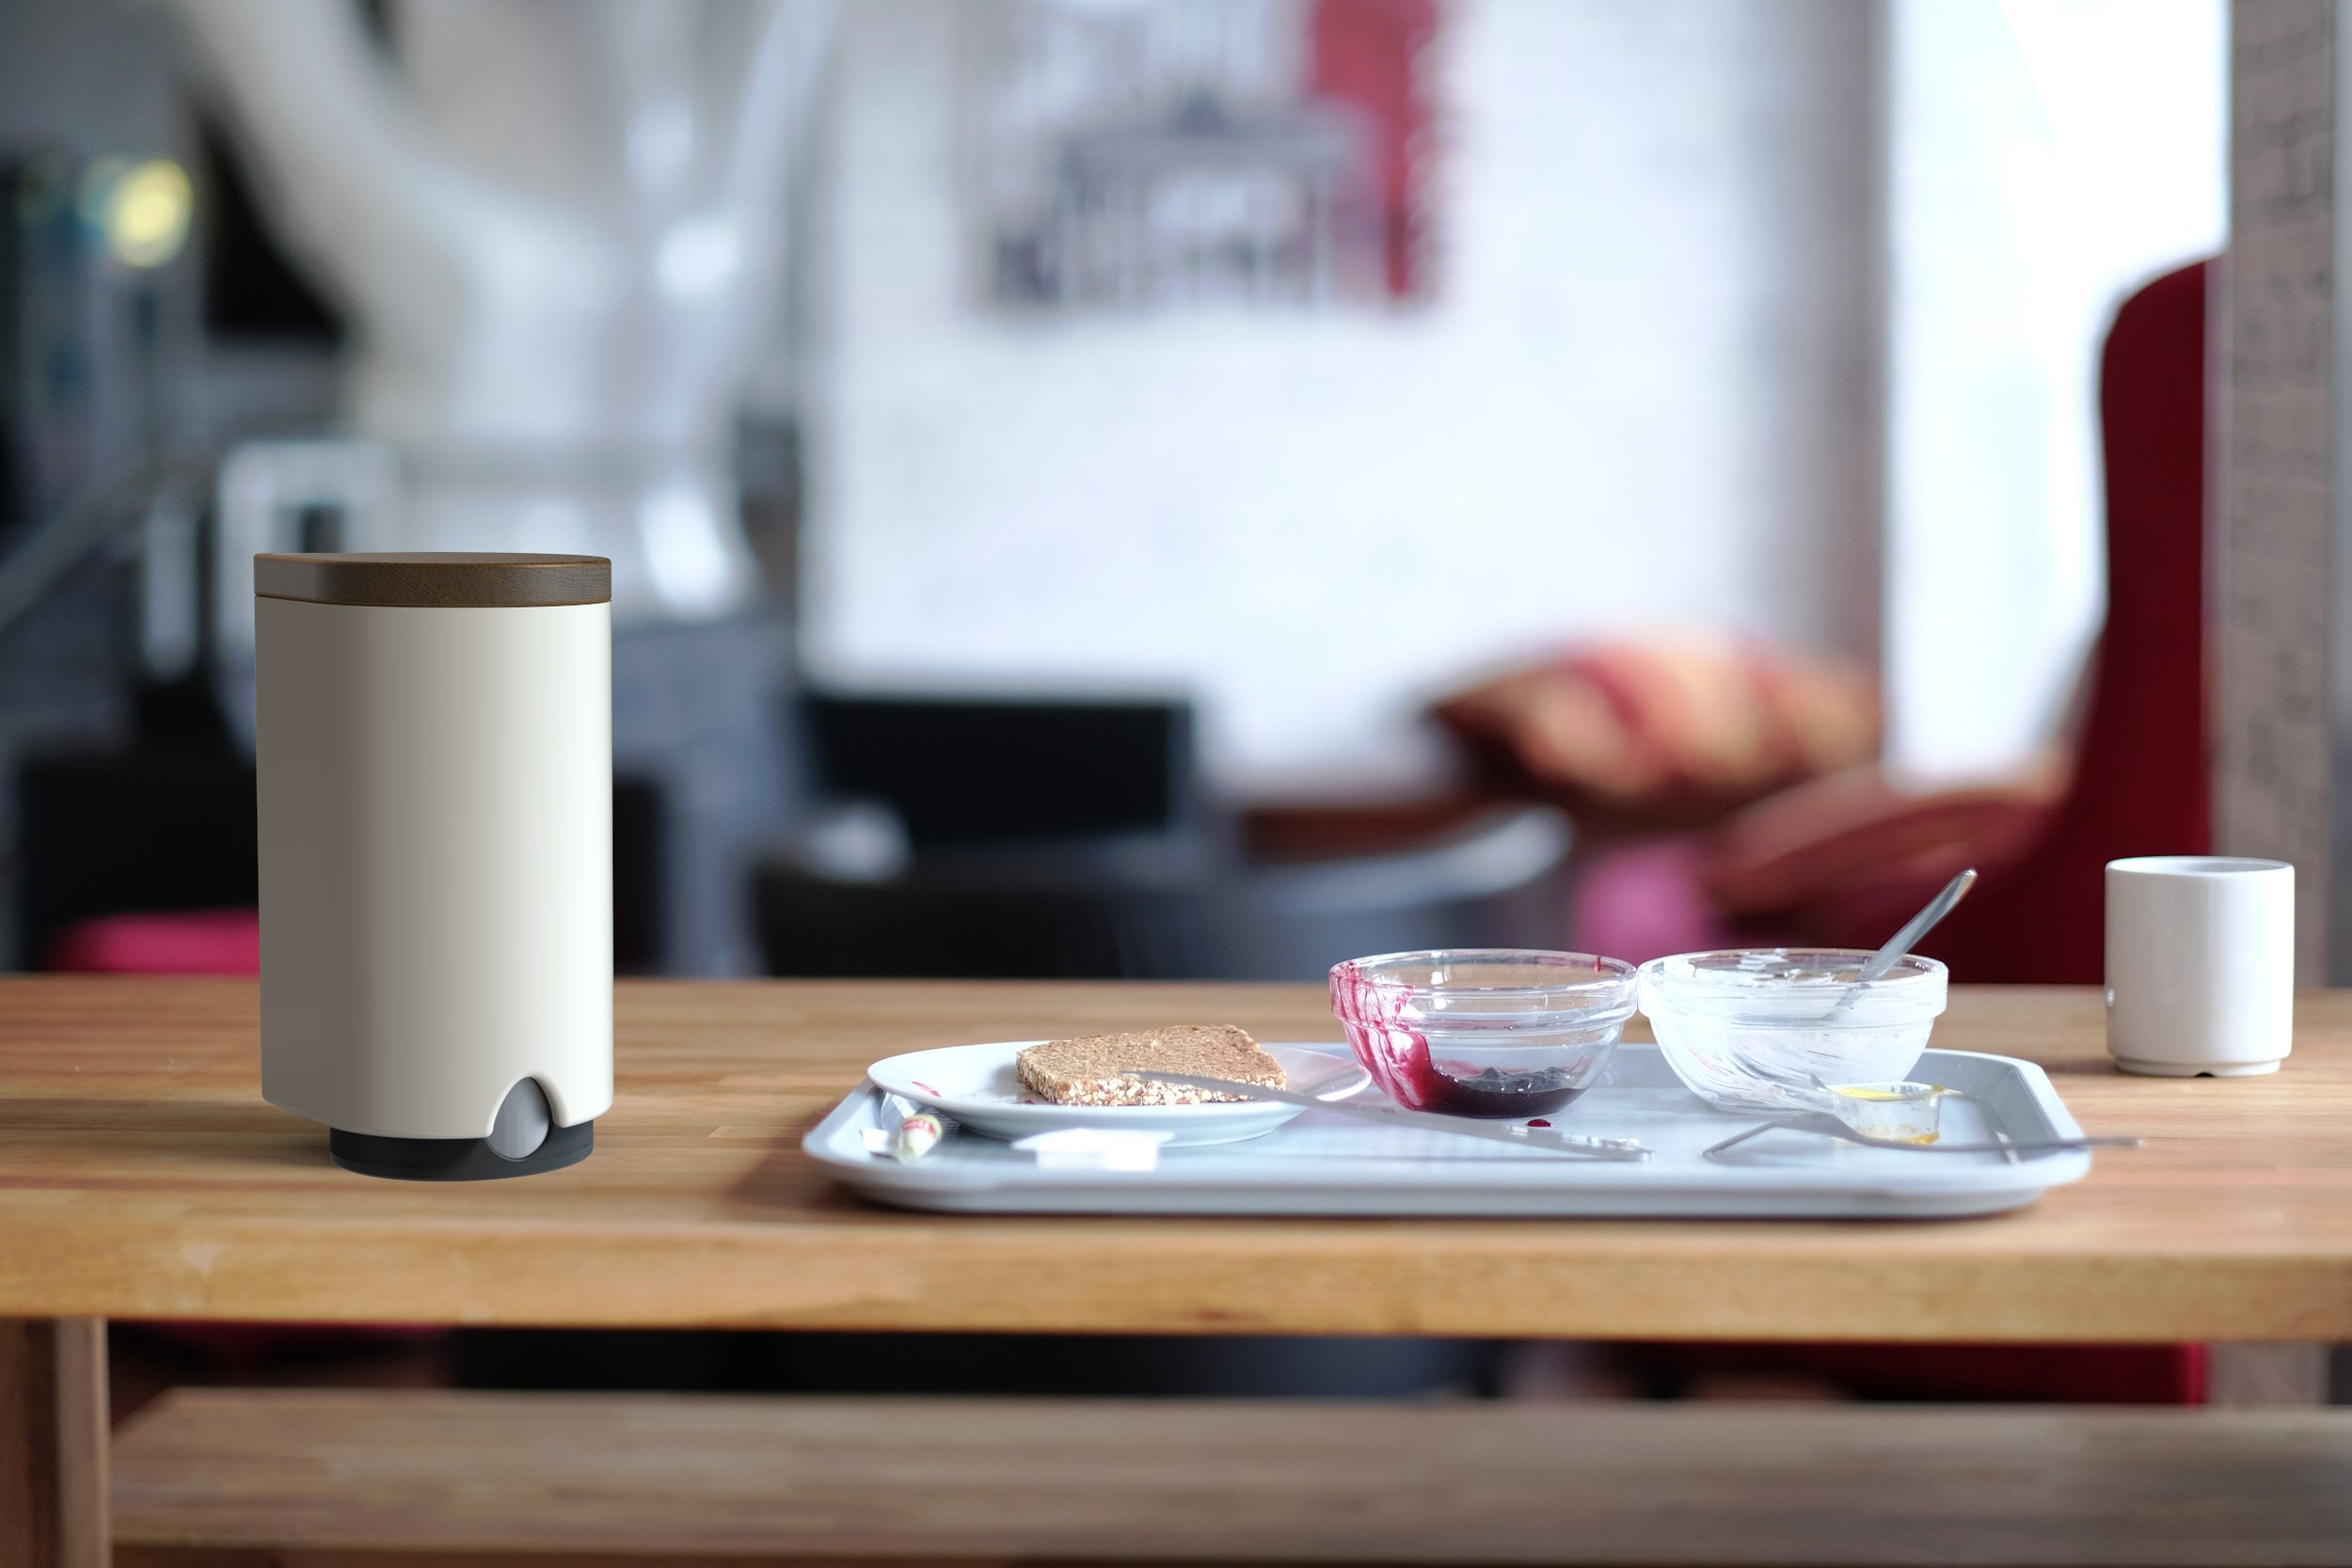 Render Coffee Canister chemx.207.jpg